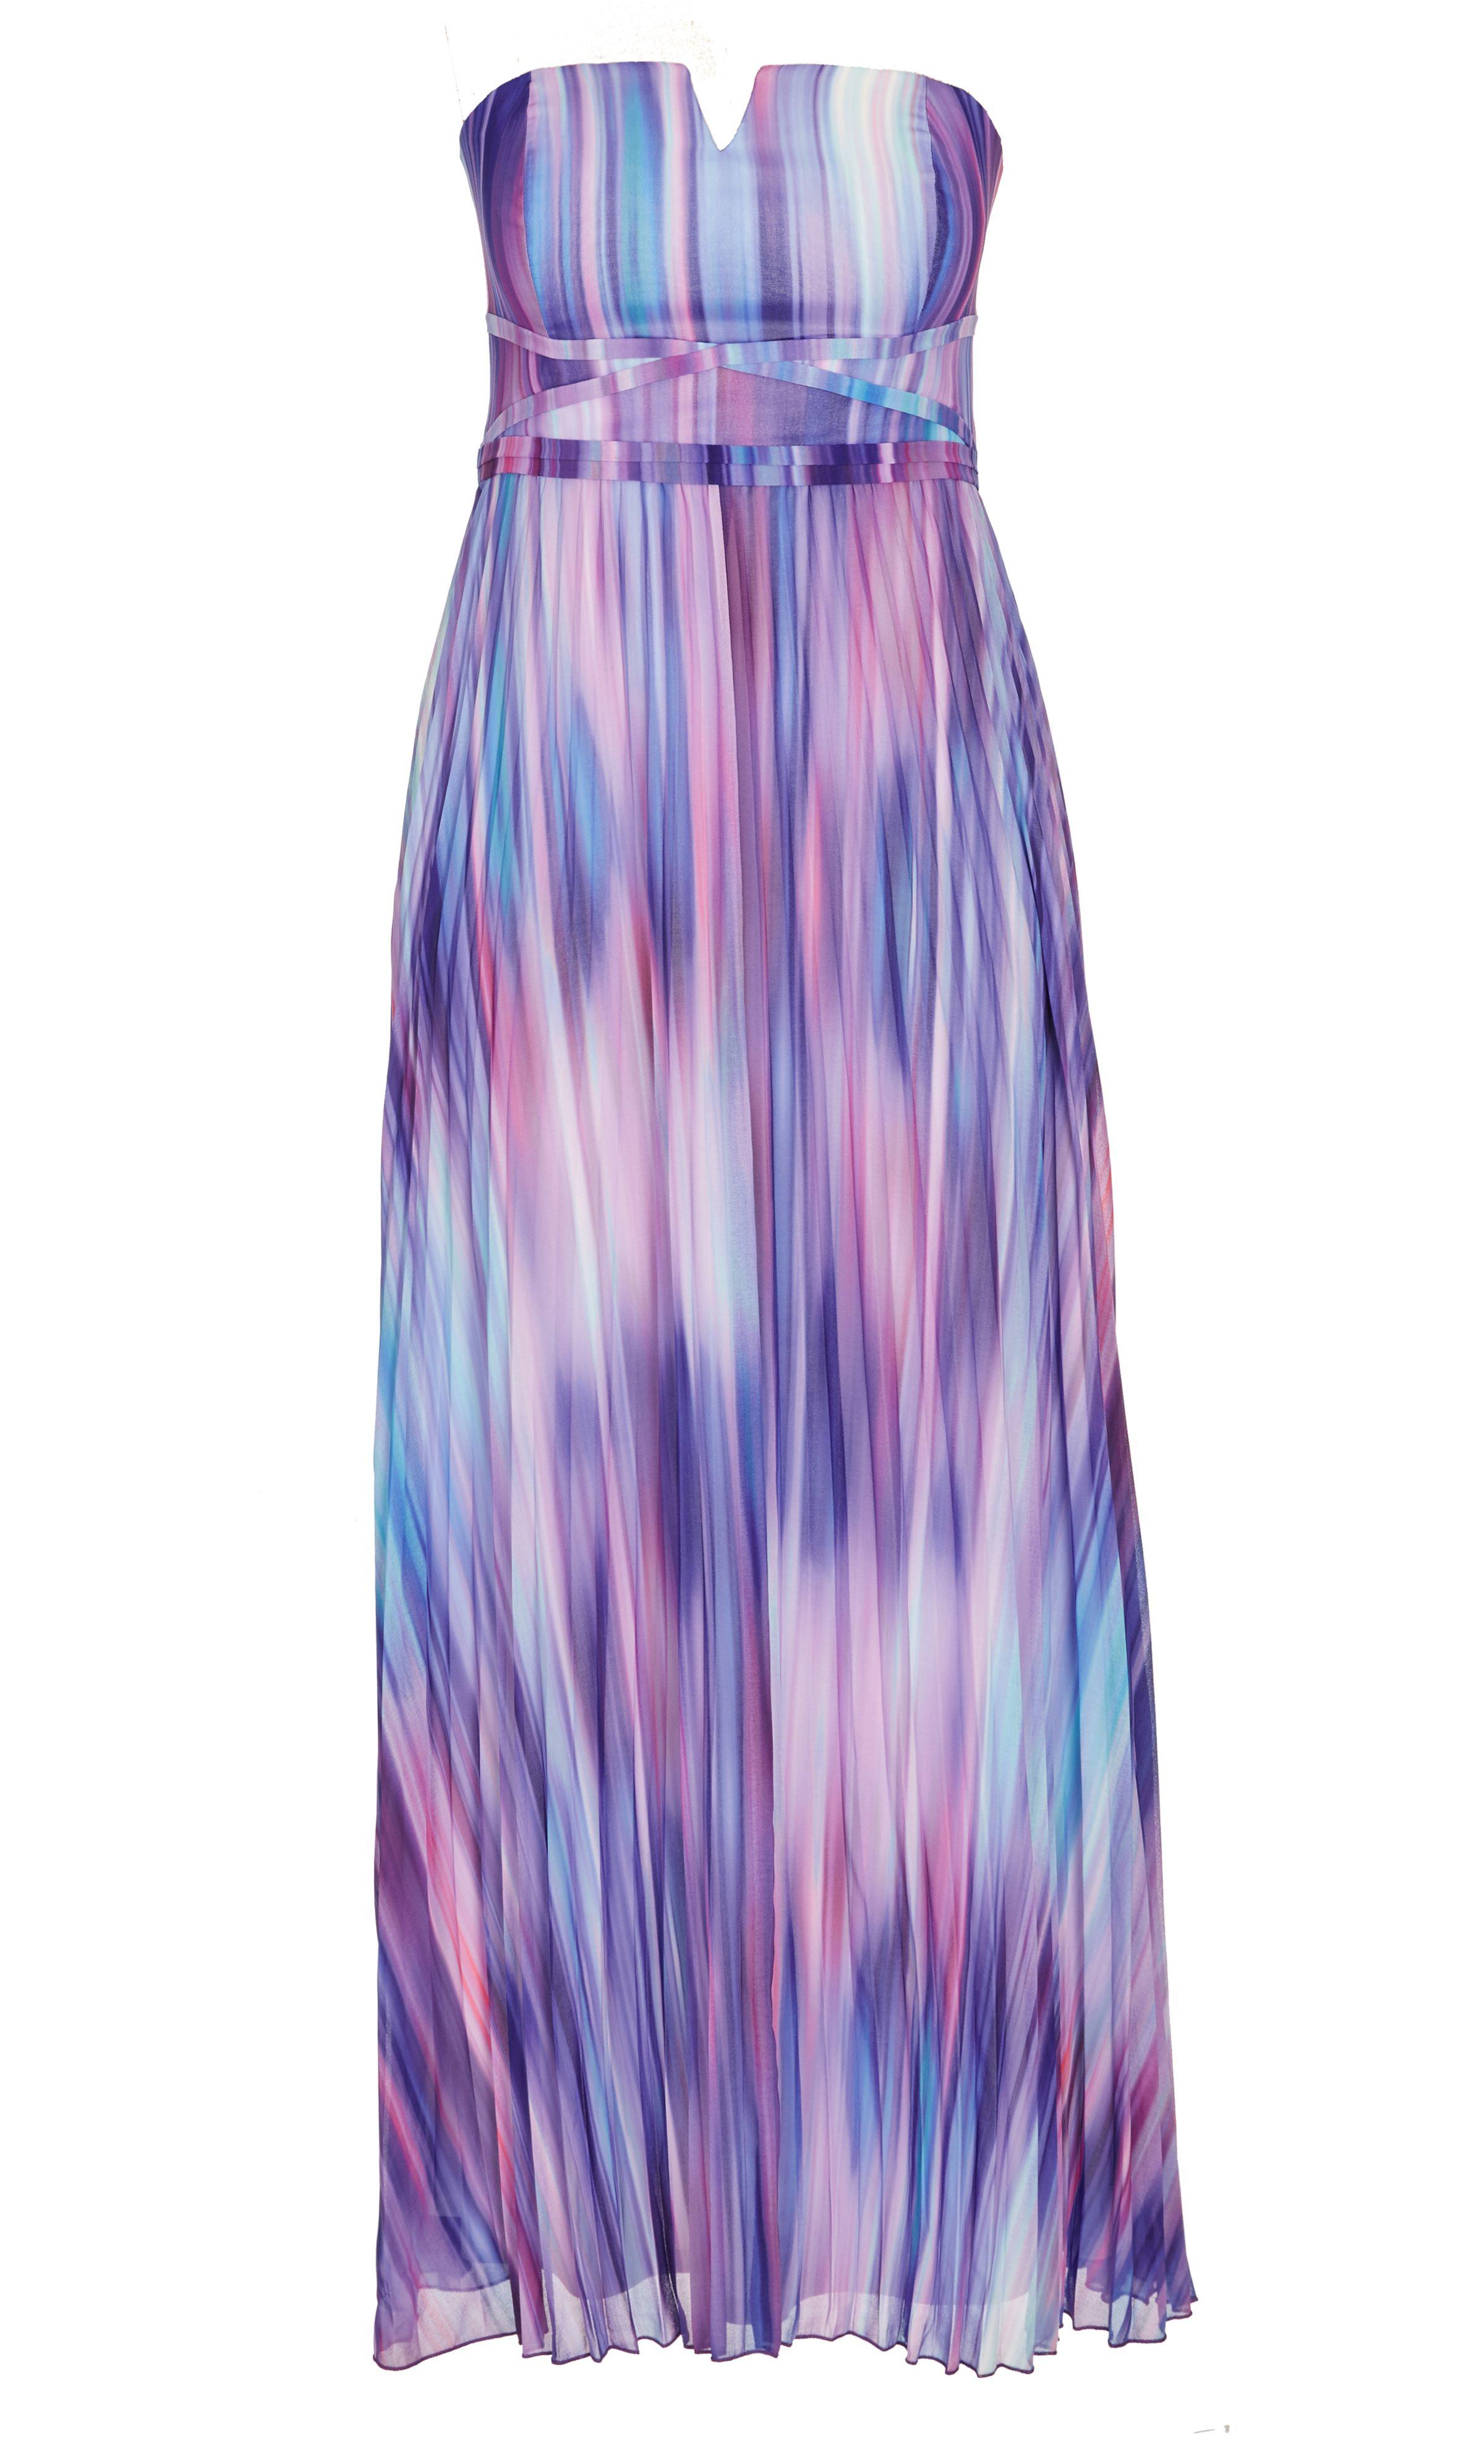 City Chic Multi Ombre Maxi Dress Womens Plus Size Fashion